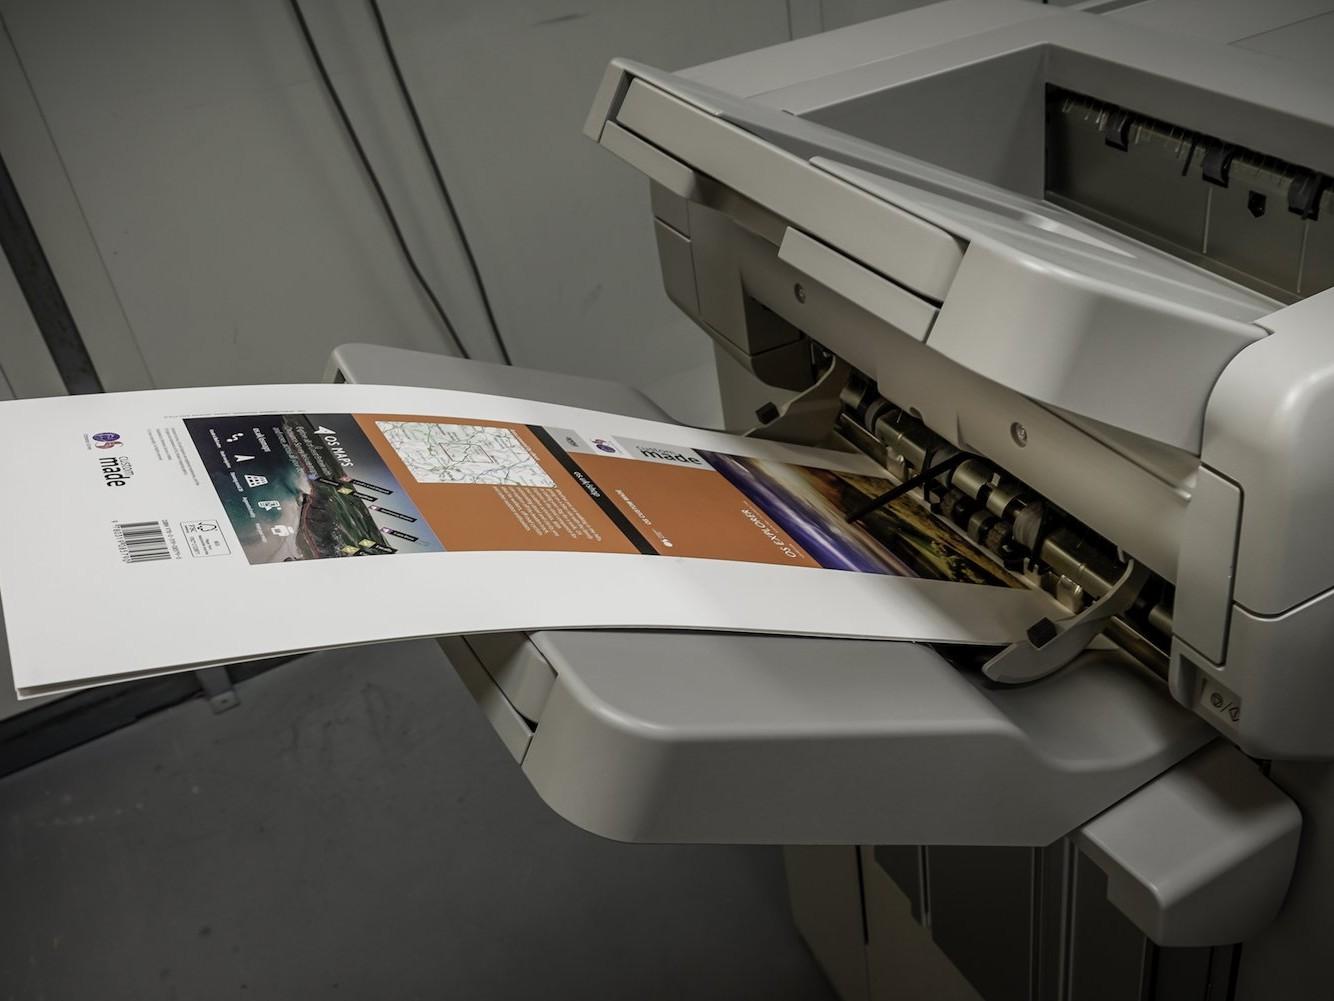 Medium format digital printing machine